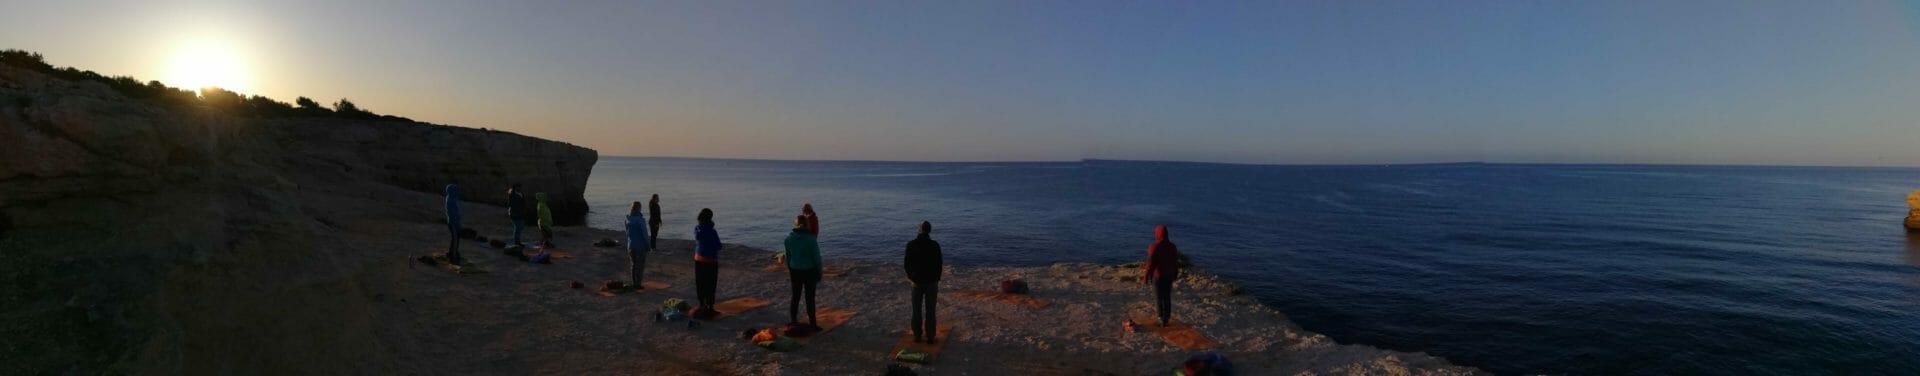 Yogagruppe auf Feslplateau am Atlantik im Yoga Retreat an der Algarve